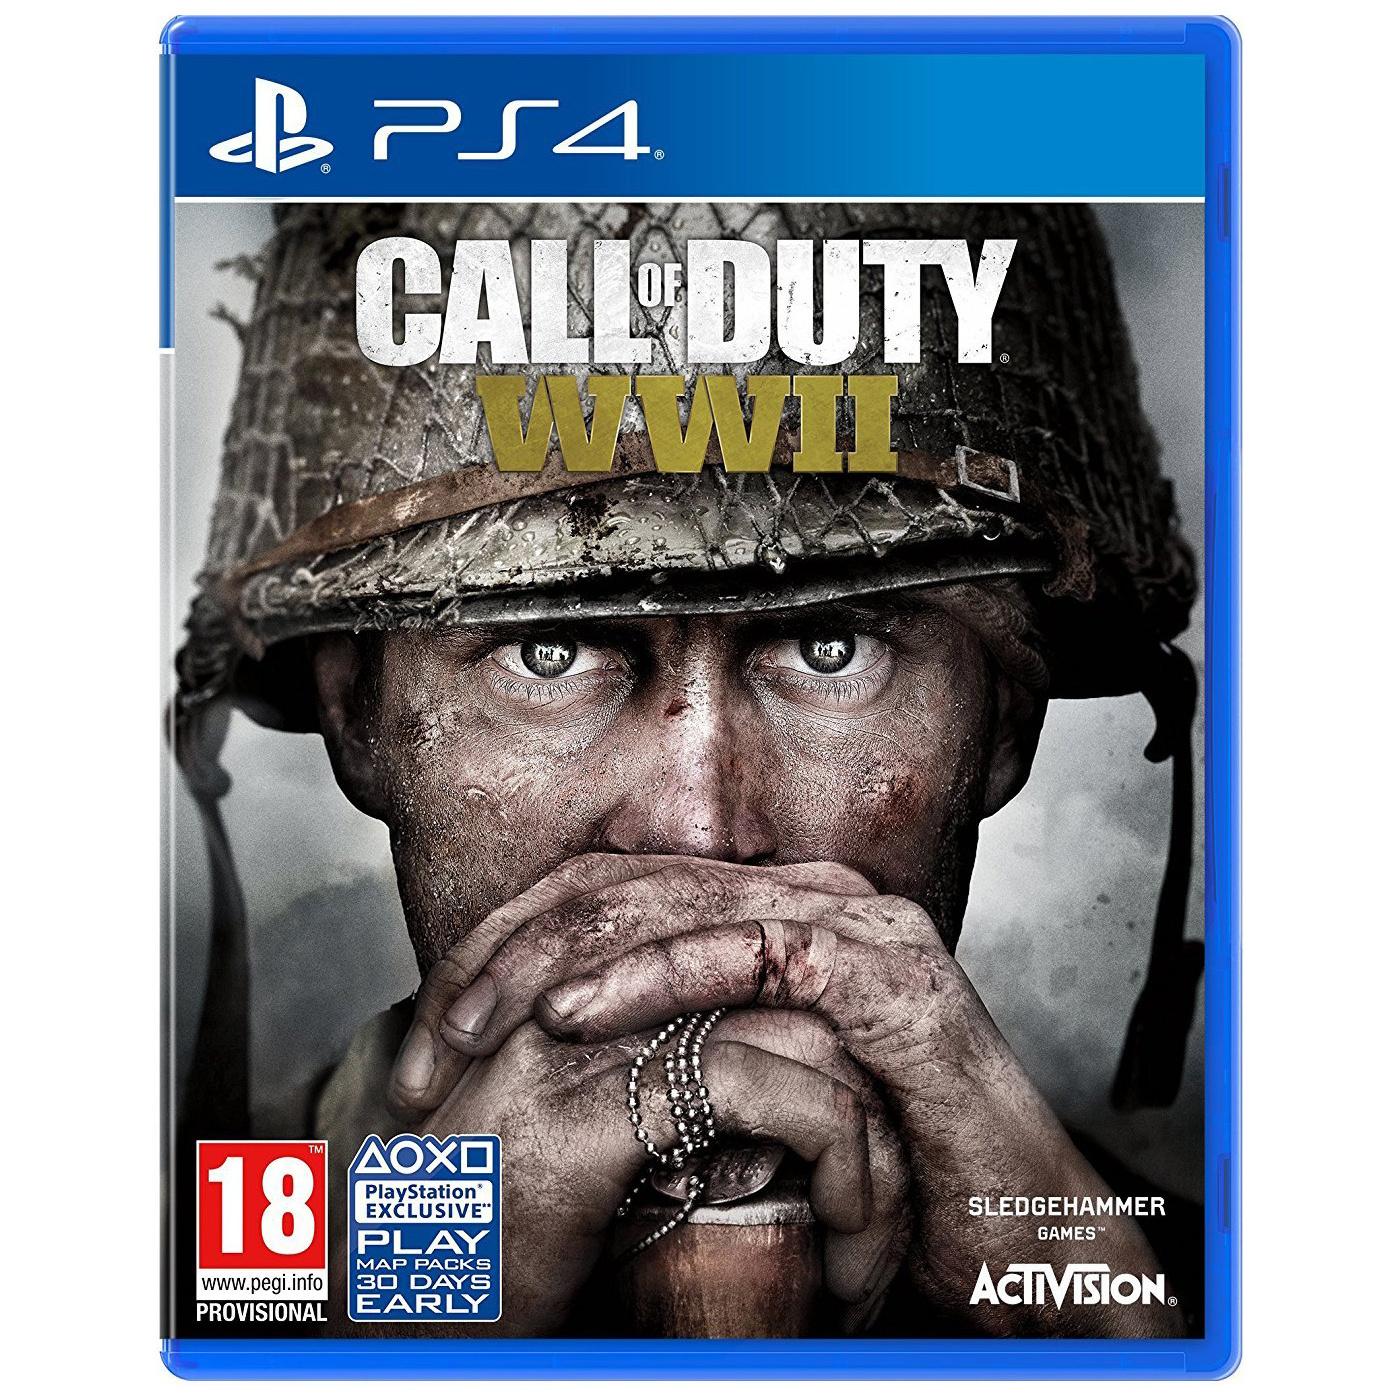 Игра Call of Duty: WWII для PlayStation